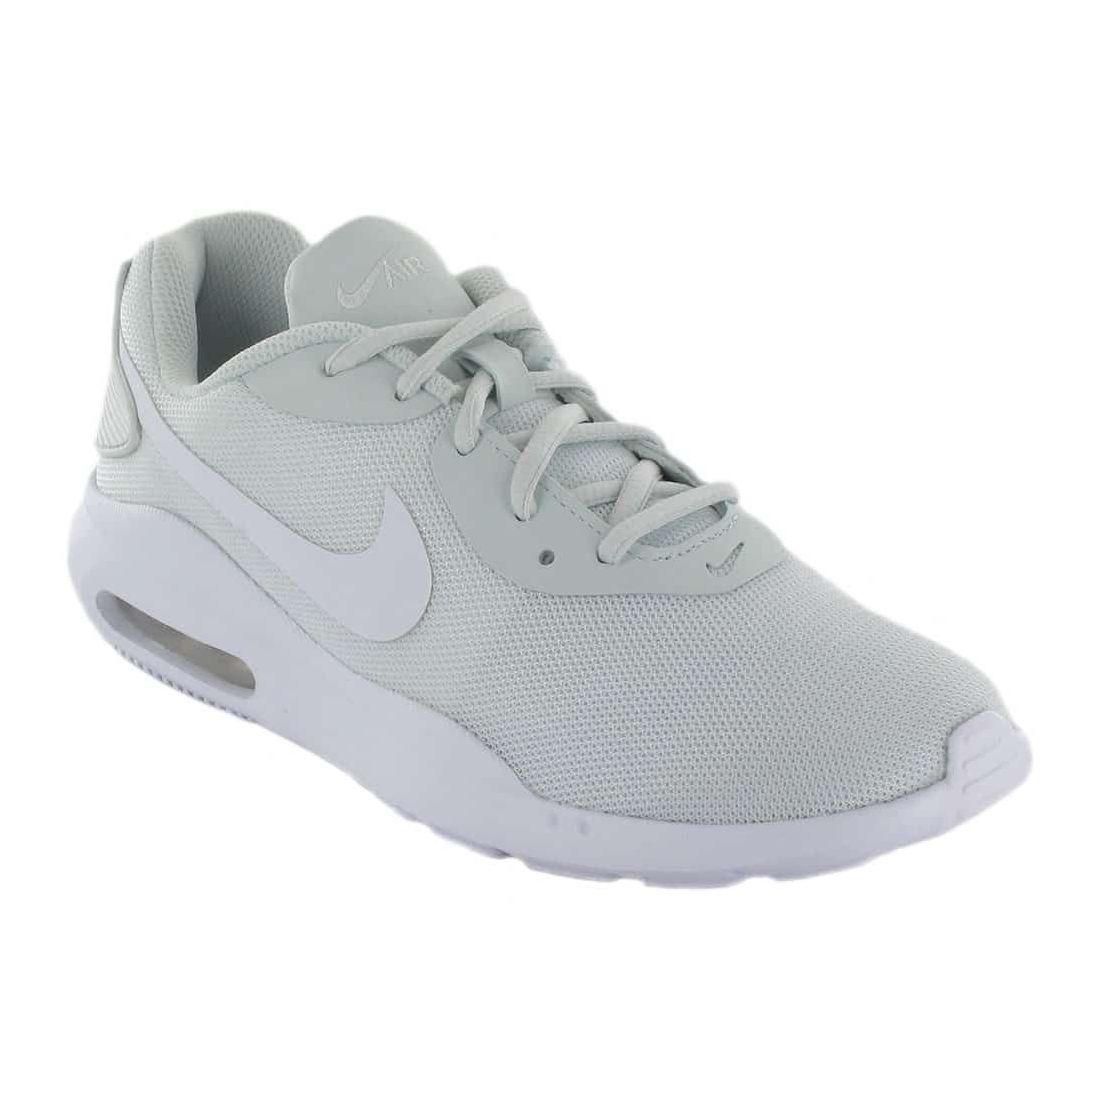 Nike Air Max Oketo W - Casual Shoe Woman